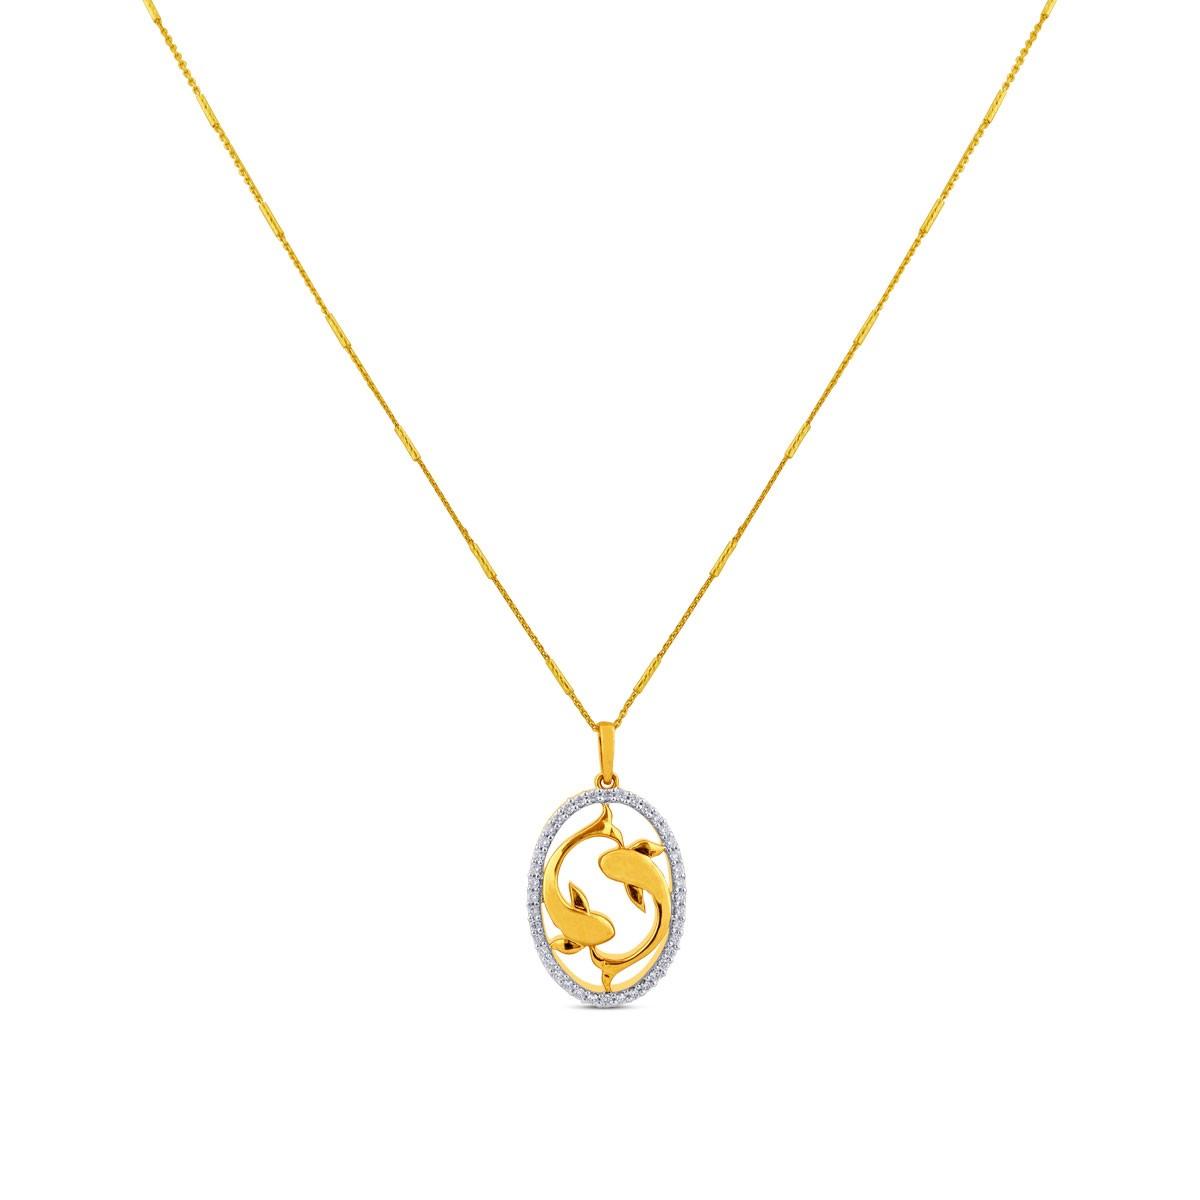 Pisces Zodiac Diamond Pendant with Chain